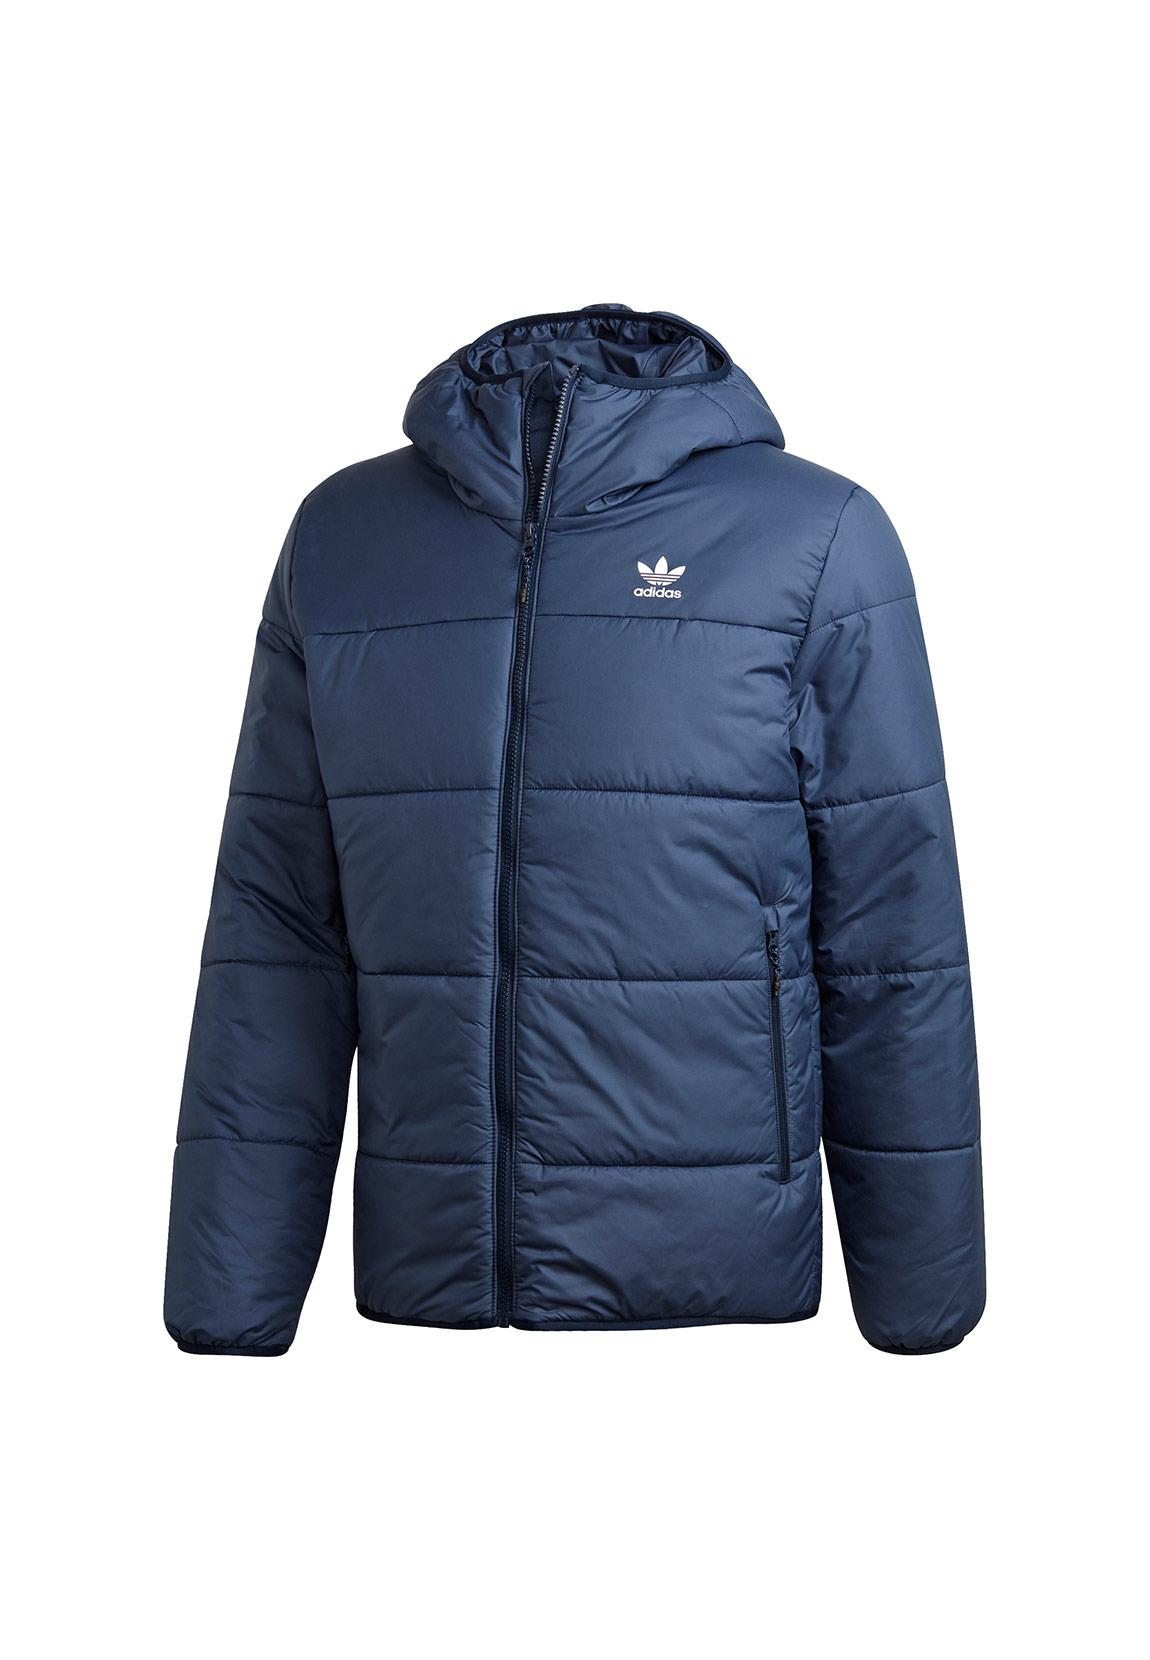 Adidas Originals Jacke Herren JACKET PADDED ED5828 Blau